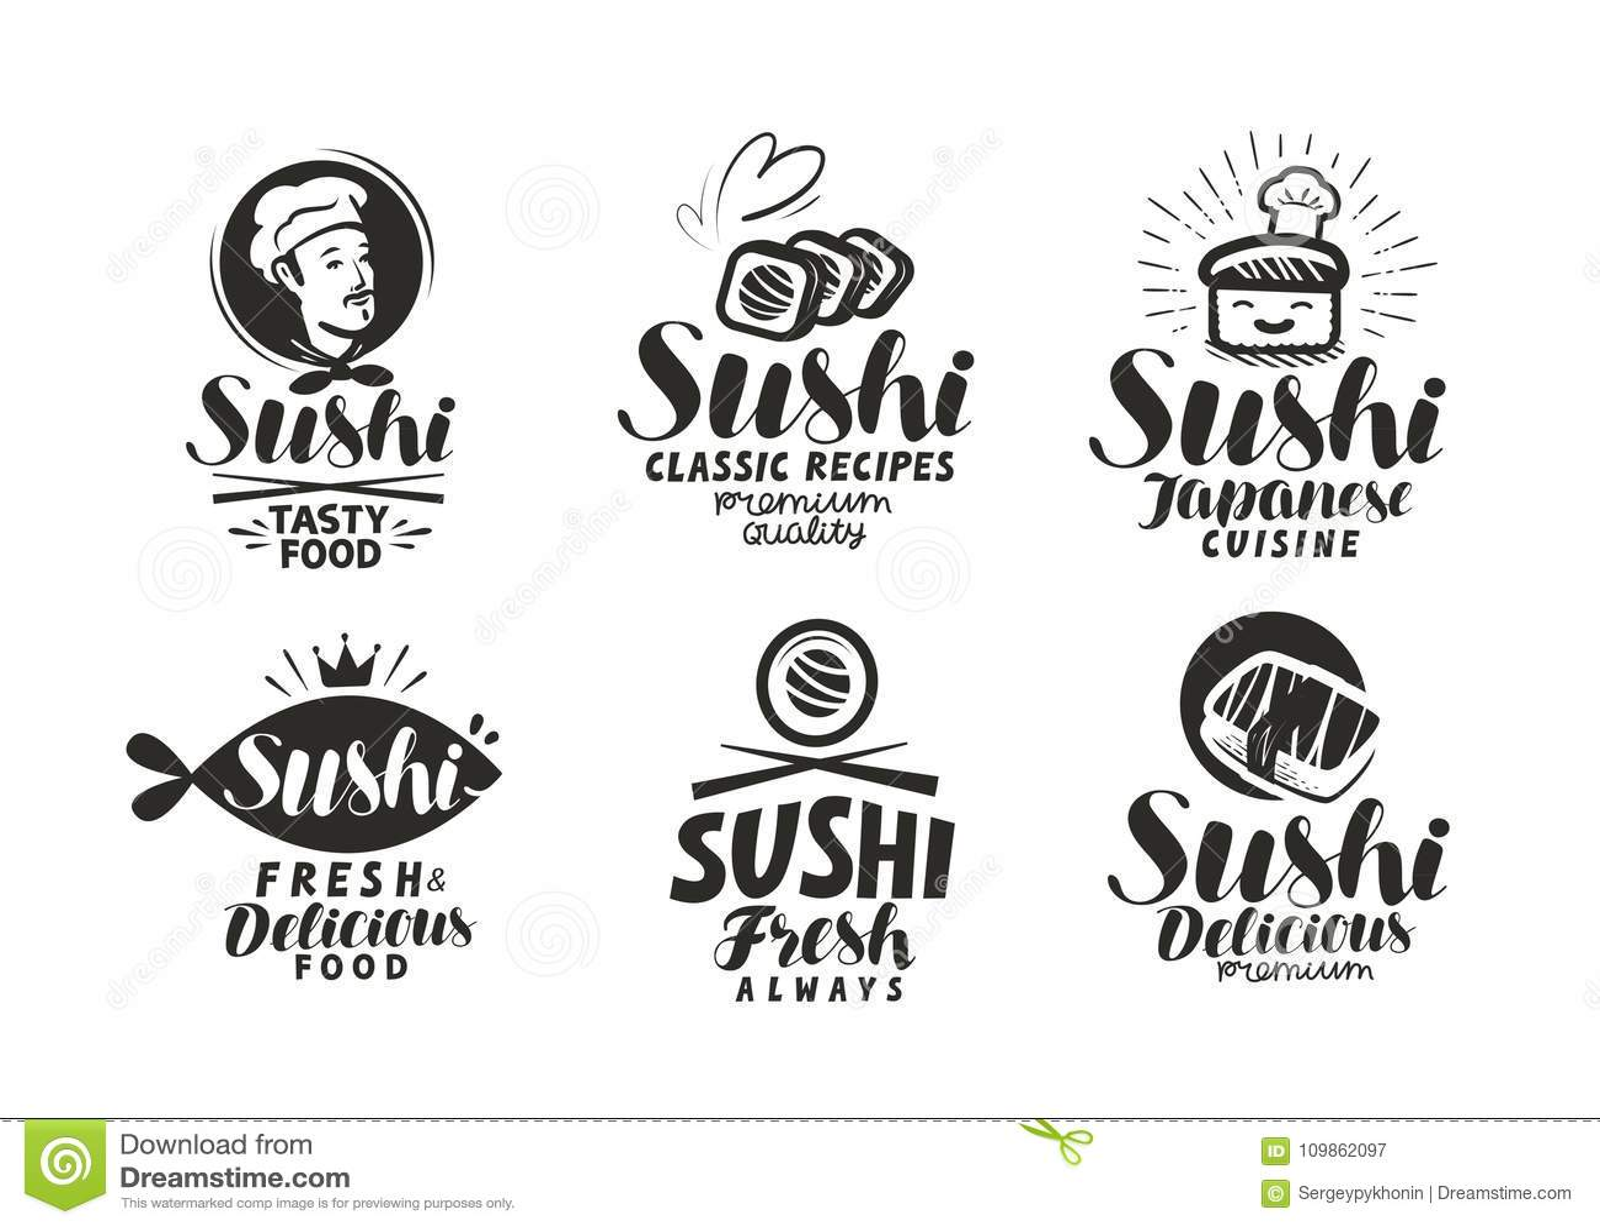 Sushi and rolls logo or label japanese food menu lettering vector download comp forumfinder Choice Image